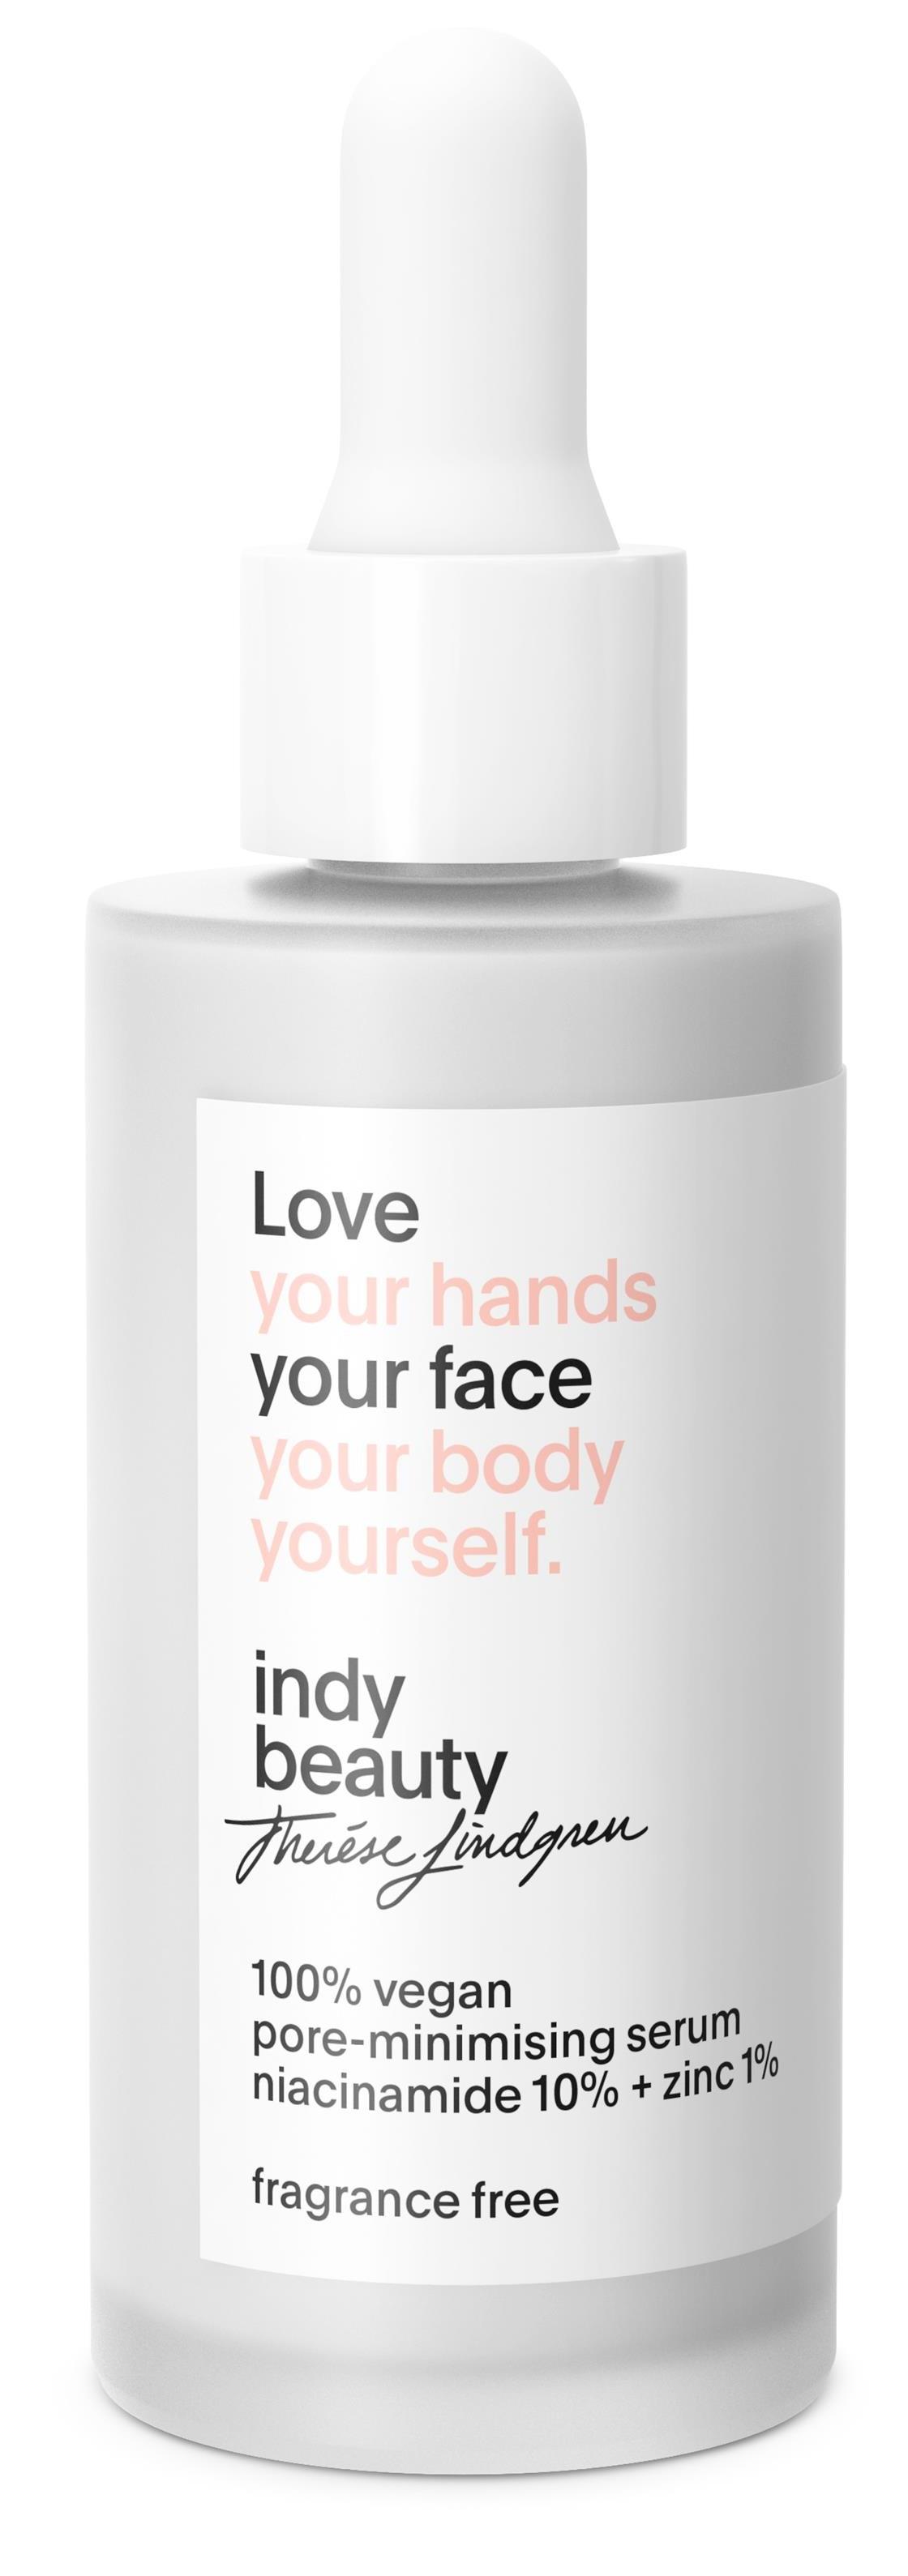 Indy Beauty Pore-Minimising Serum Niacinamide 10% + Zinc 1%